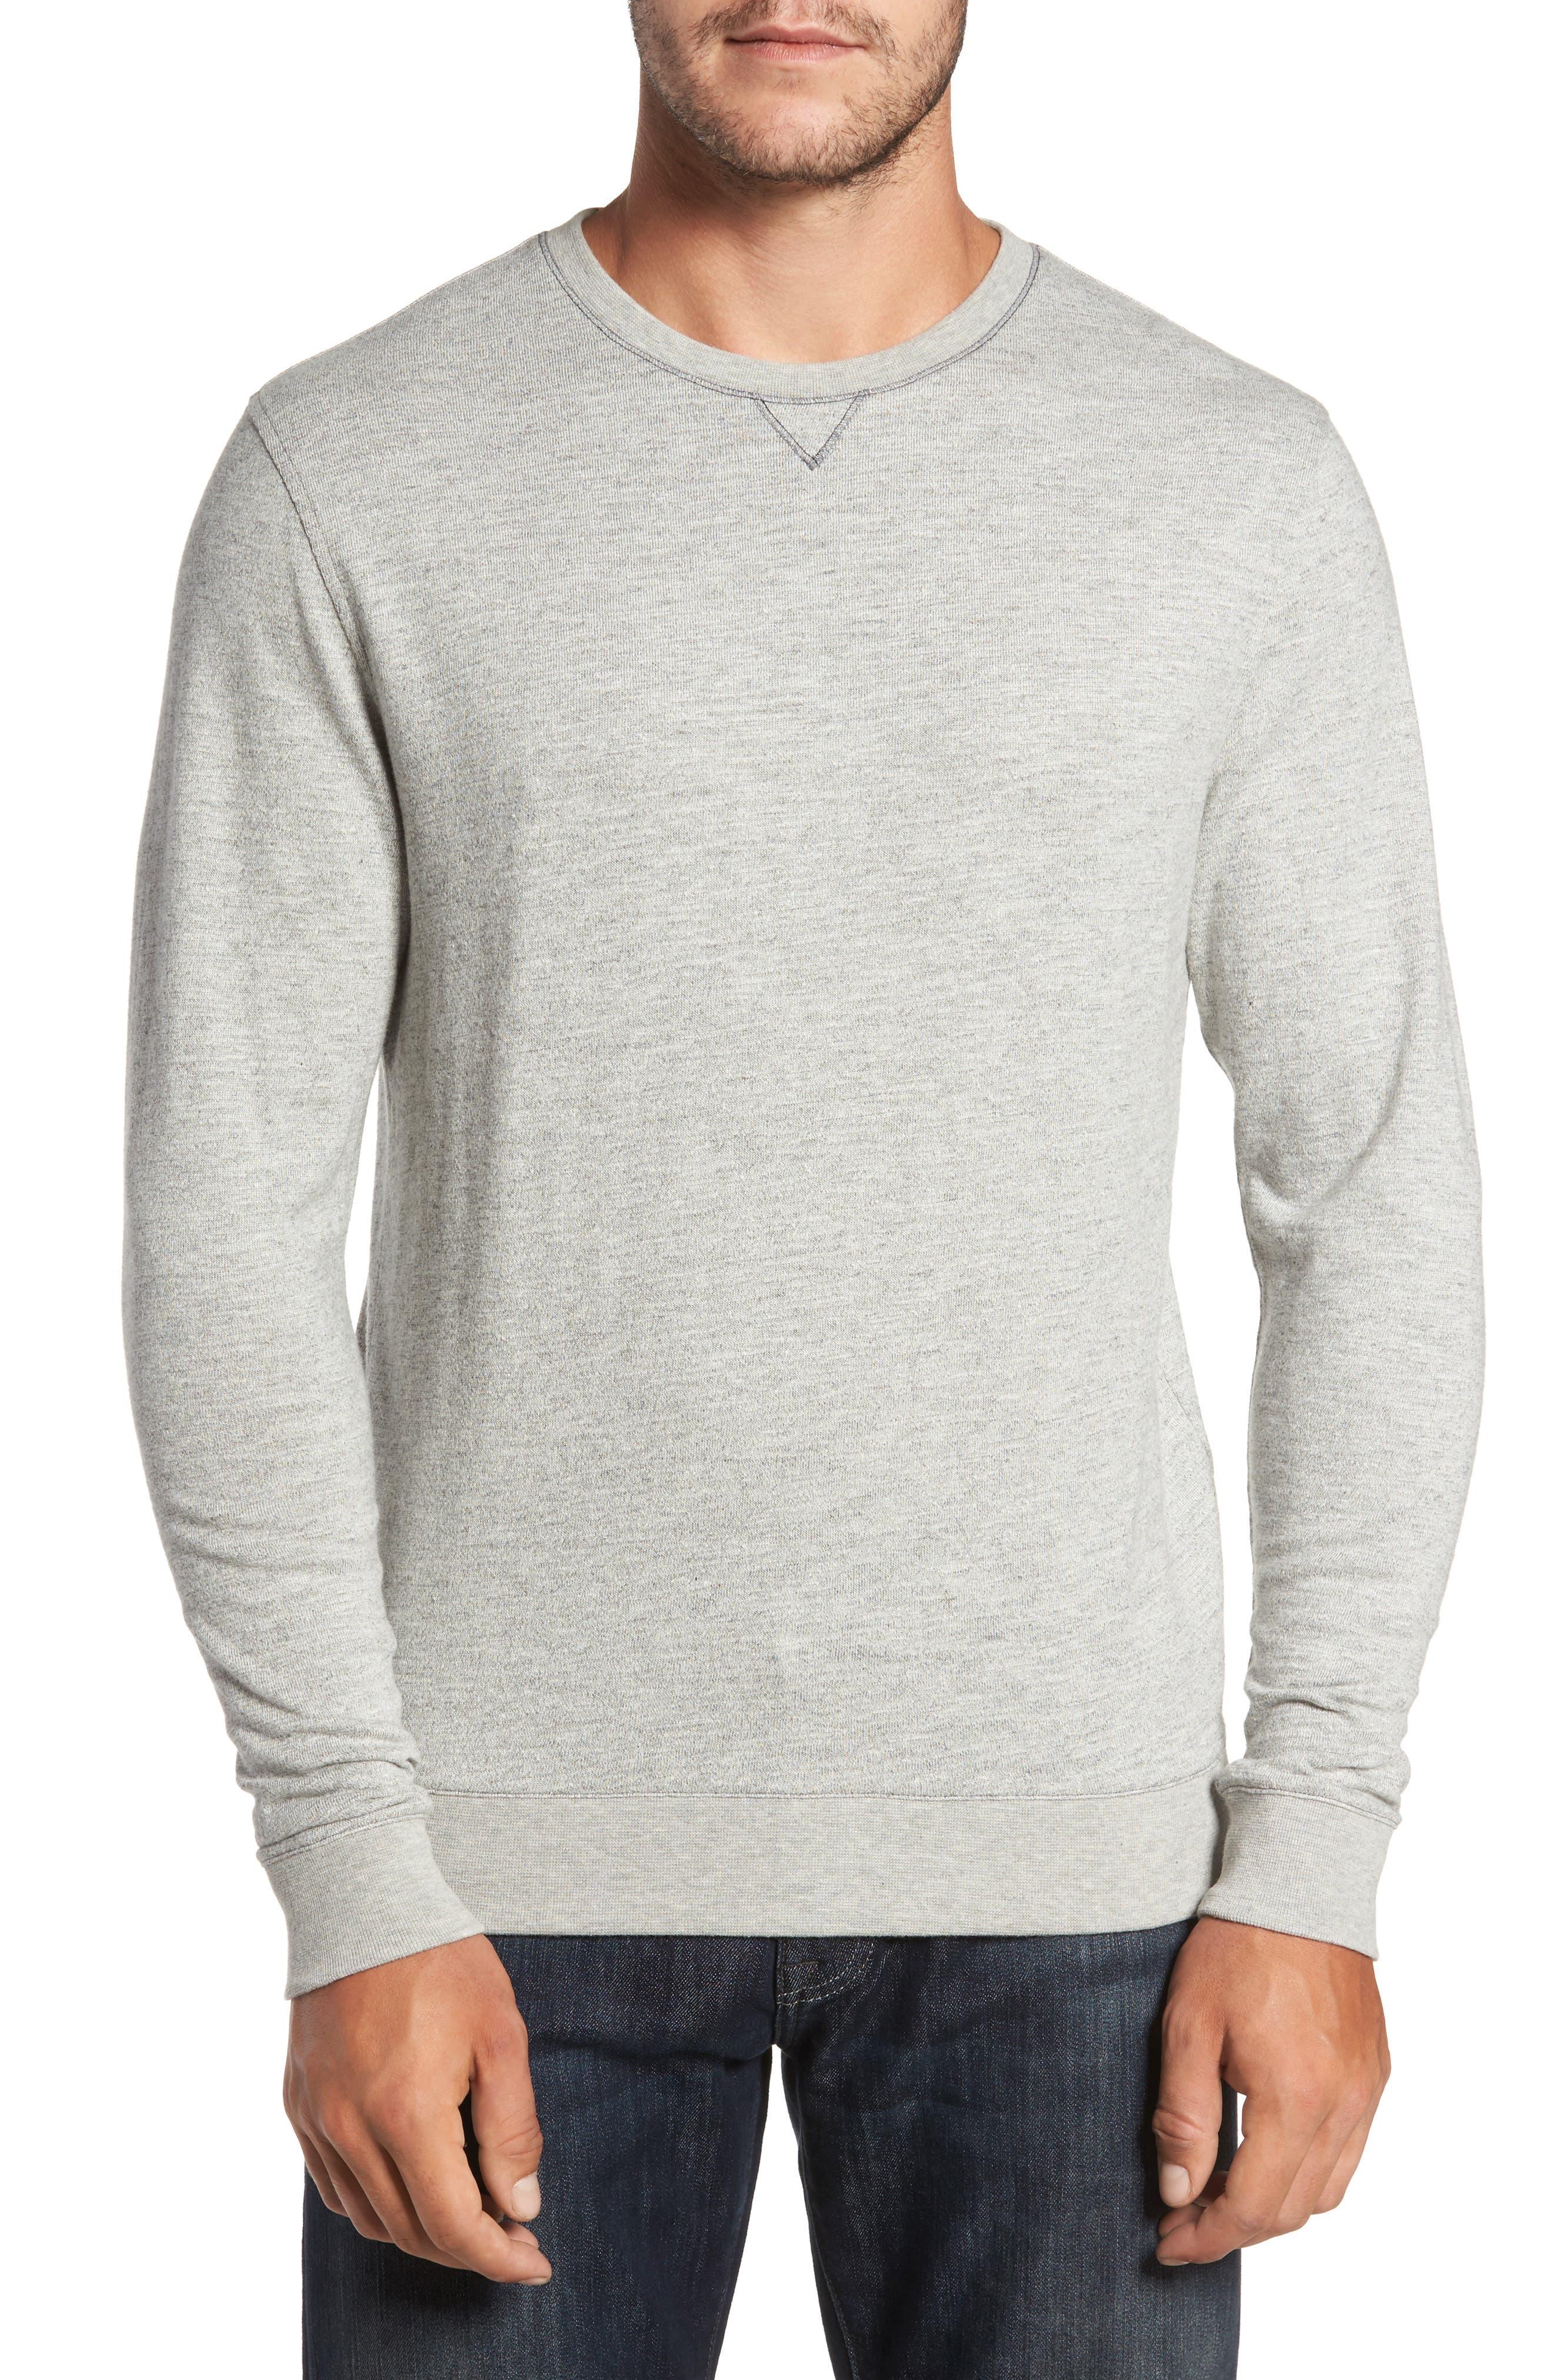 Vienna French Terry T-Shirt,                             Main thumbnail 1, color,                             Light Grey